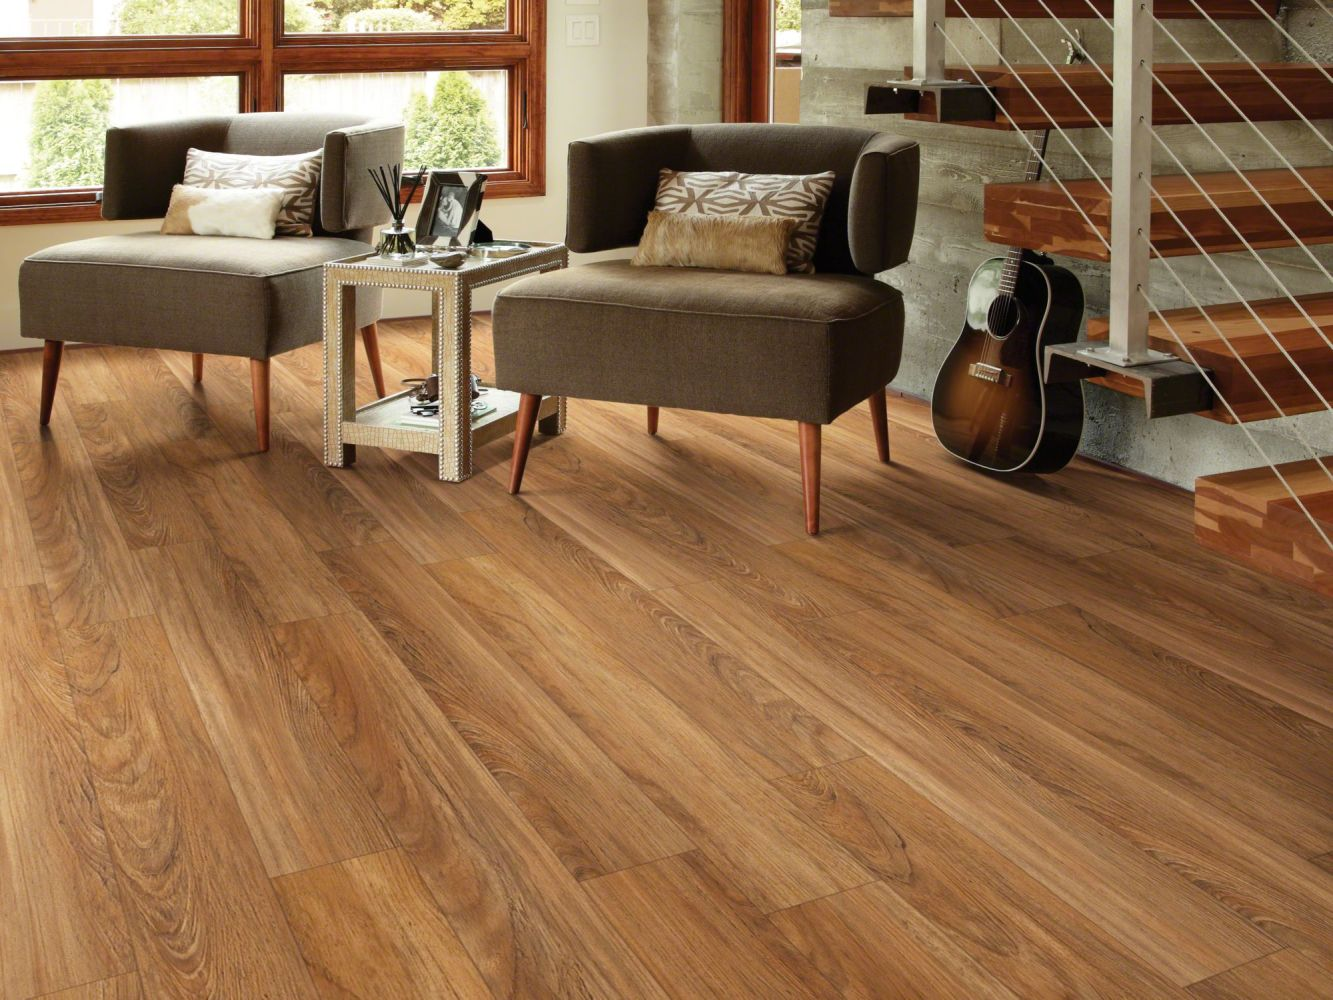 Shaw Floors Resilient Residential San Gorgonio Plus Teak 00603_HSS44